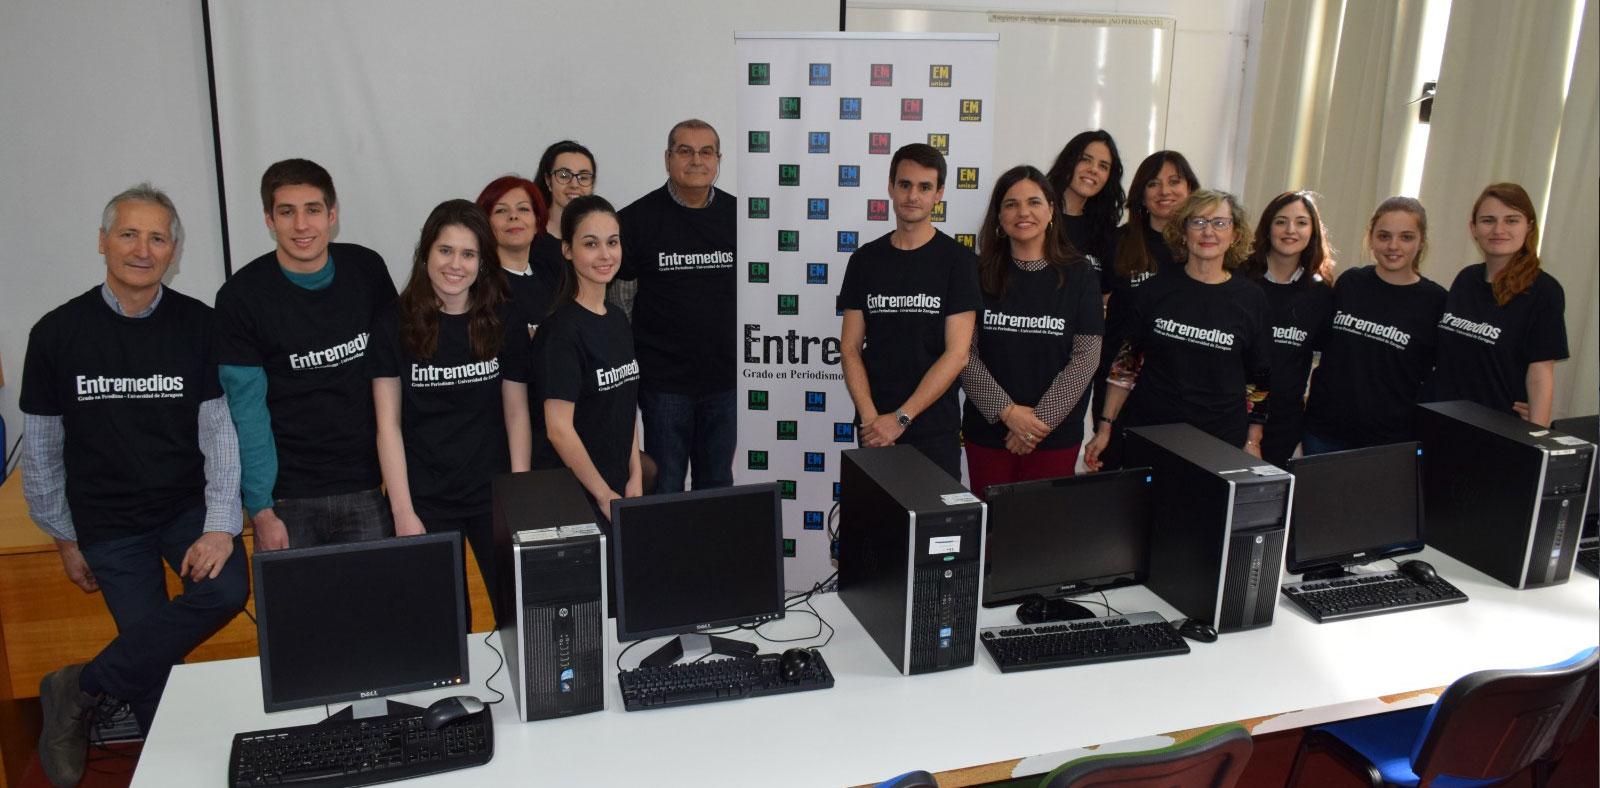 Equipo Entremedios 2019